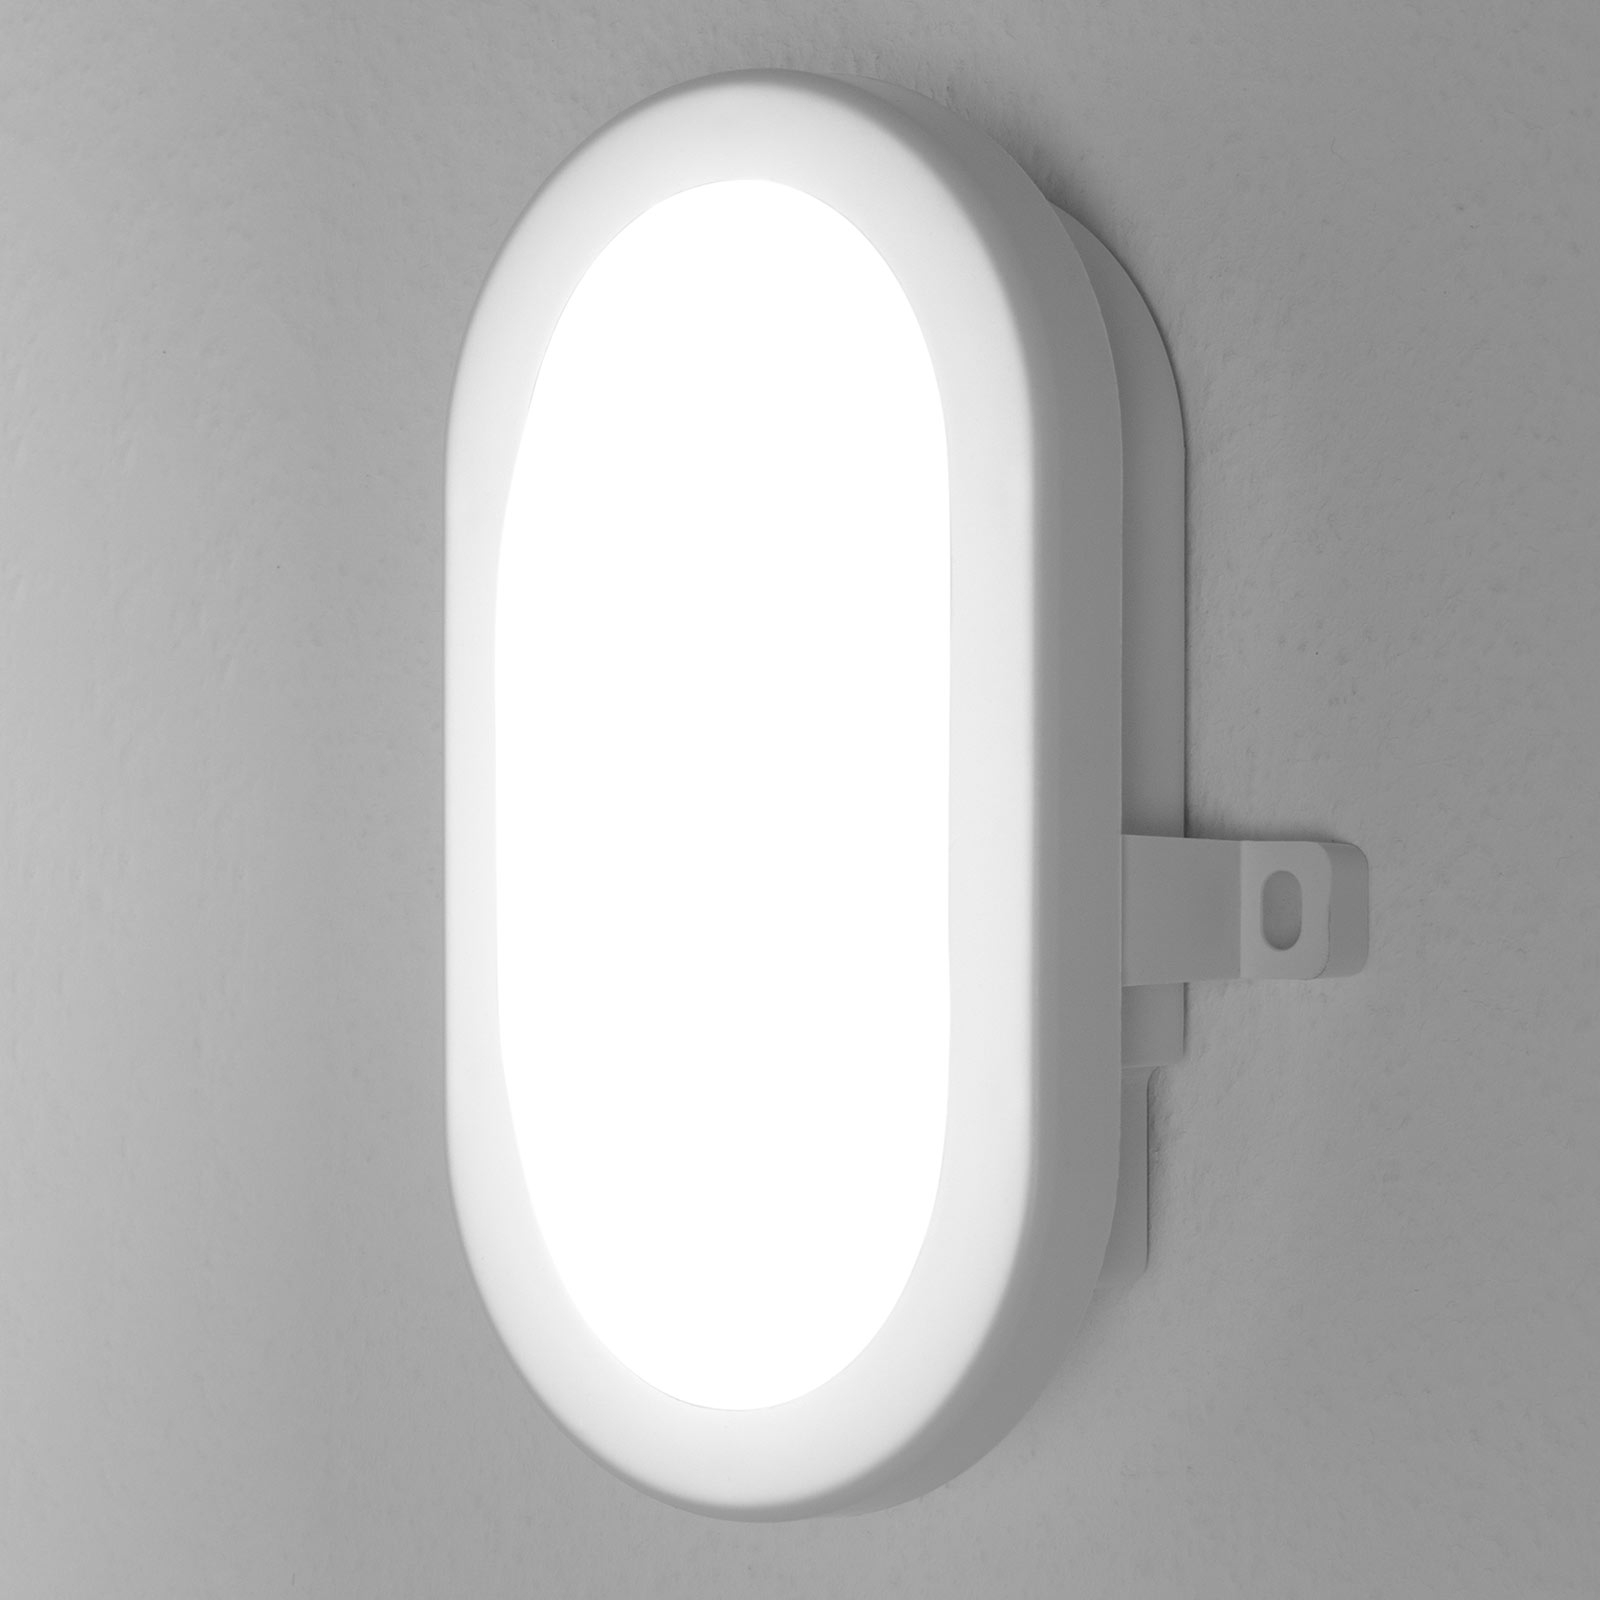 LEDVANCE Bulkhead LED-Außenwandlampe 5,5W in Weiß